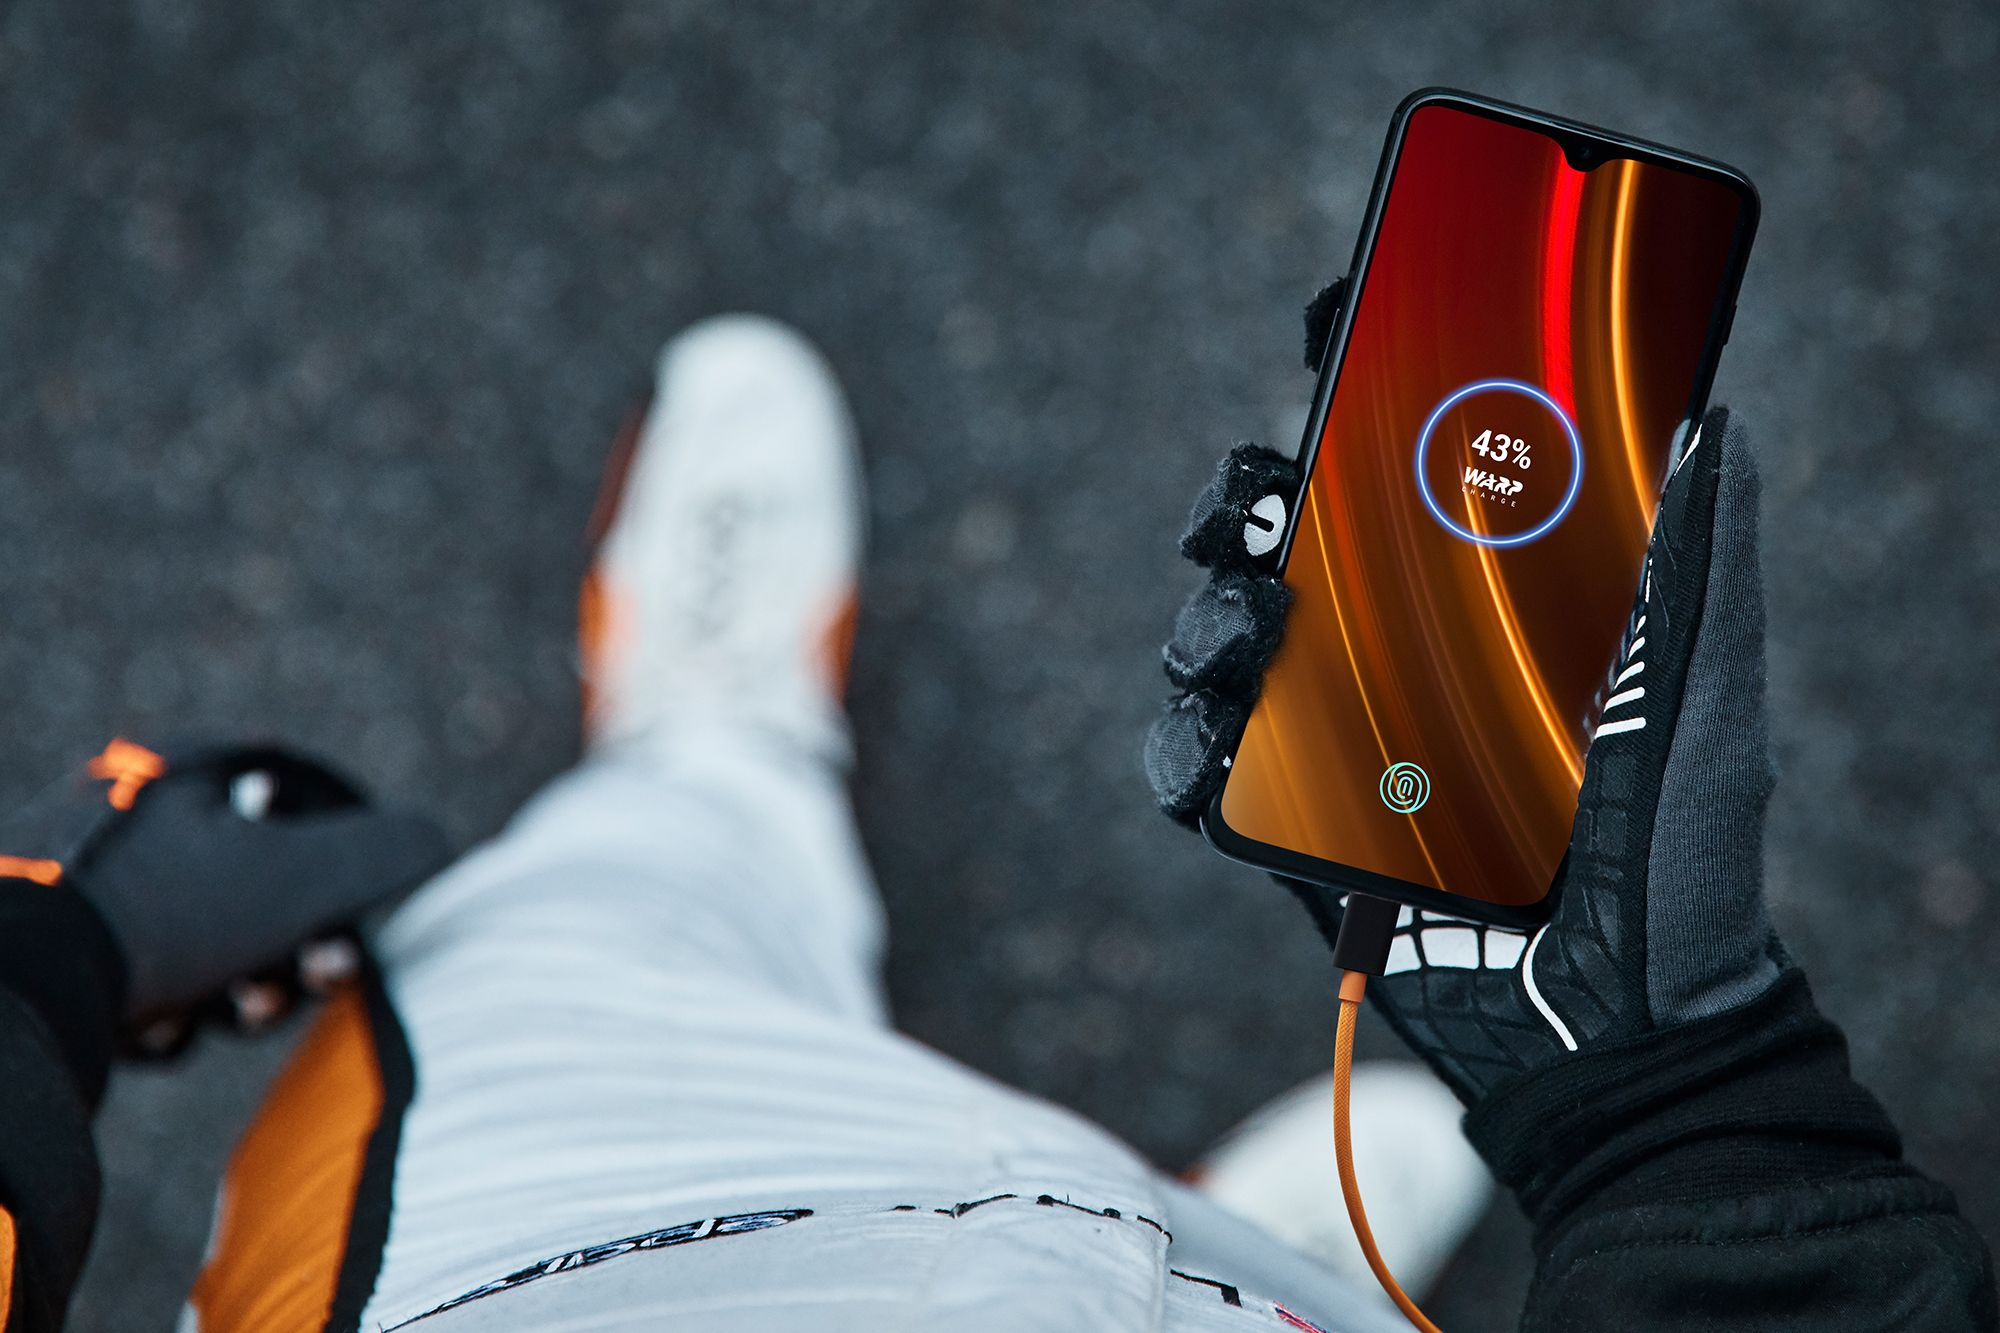 OnePlus 6T x McLaren